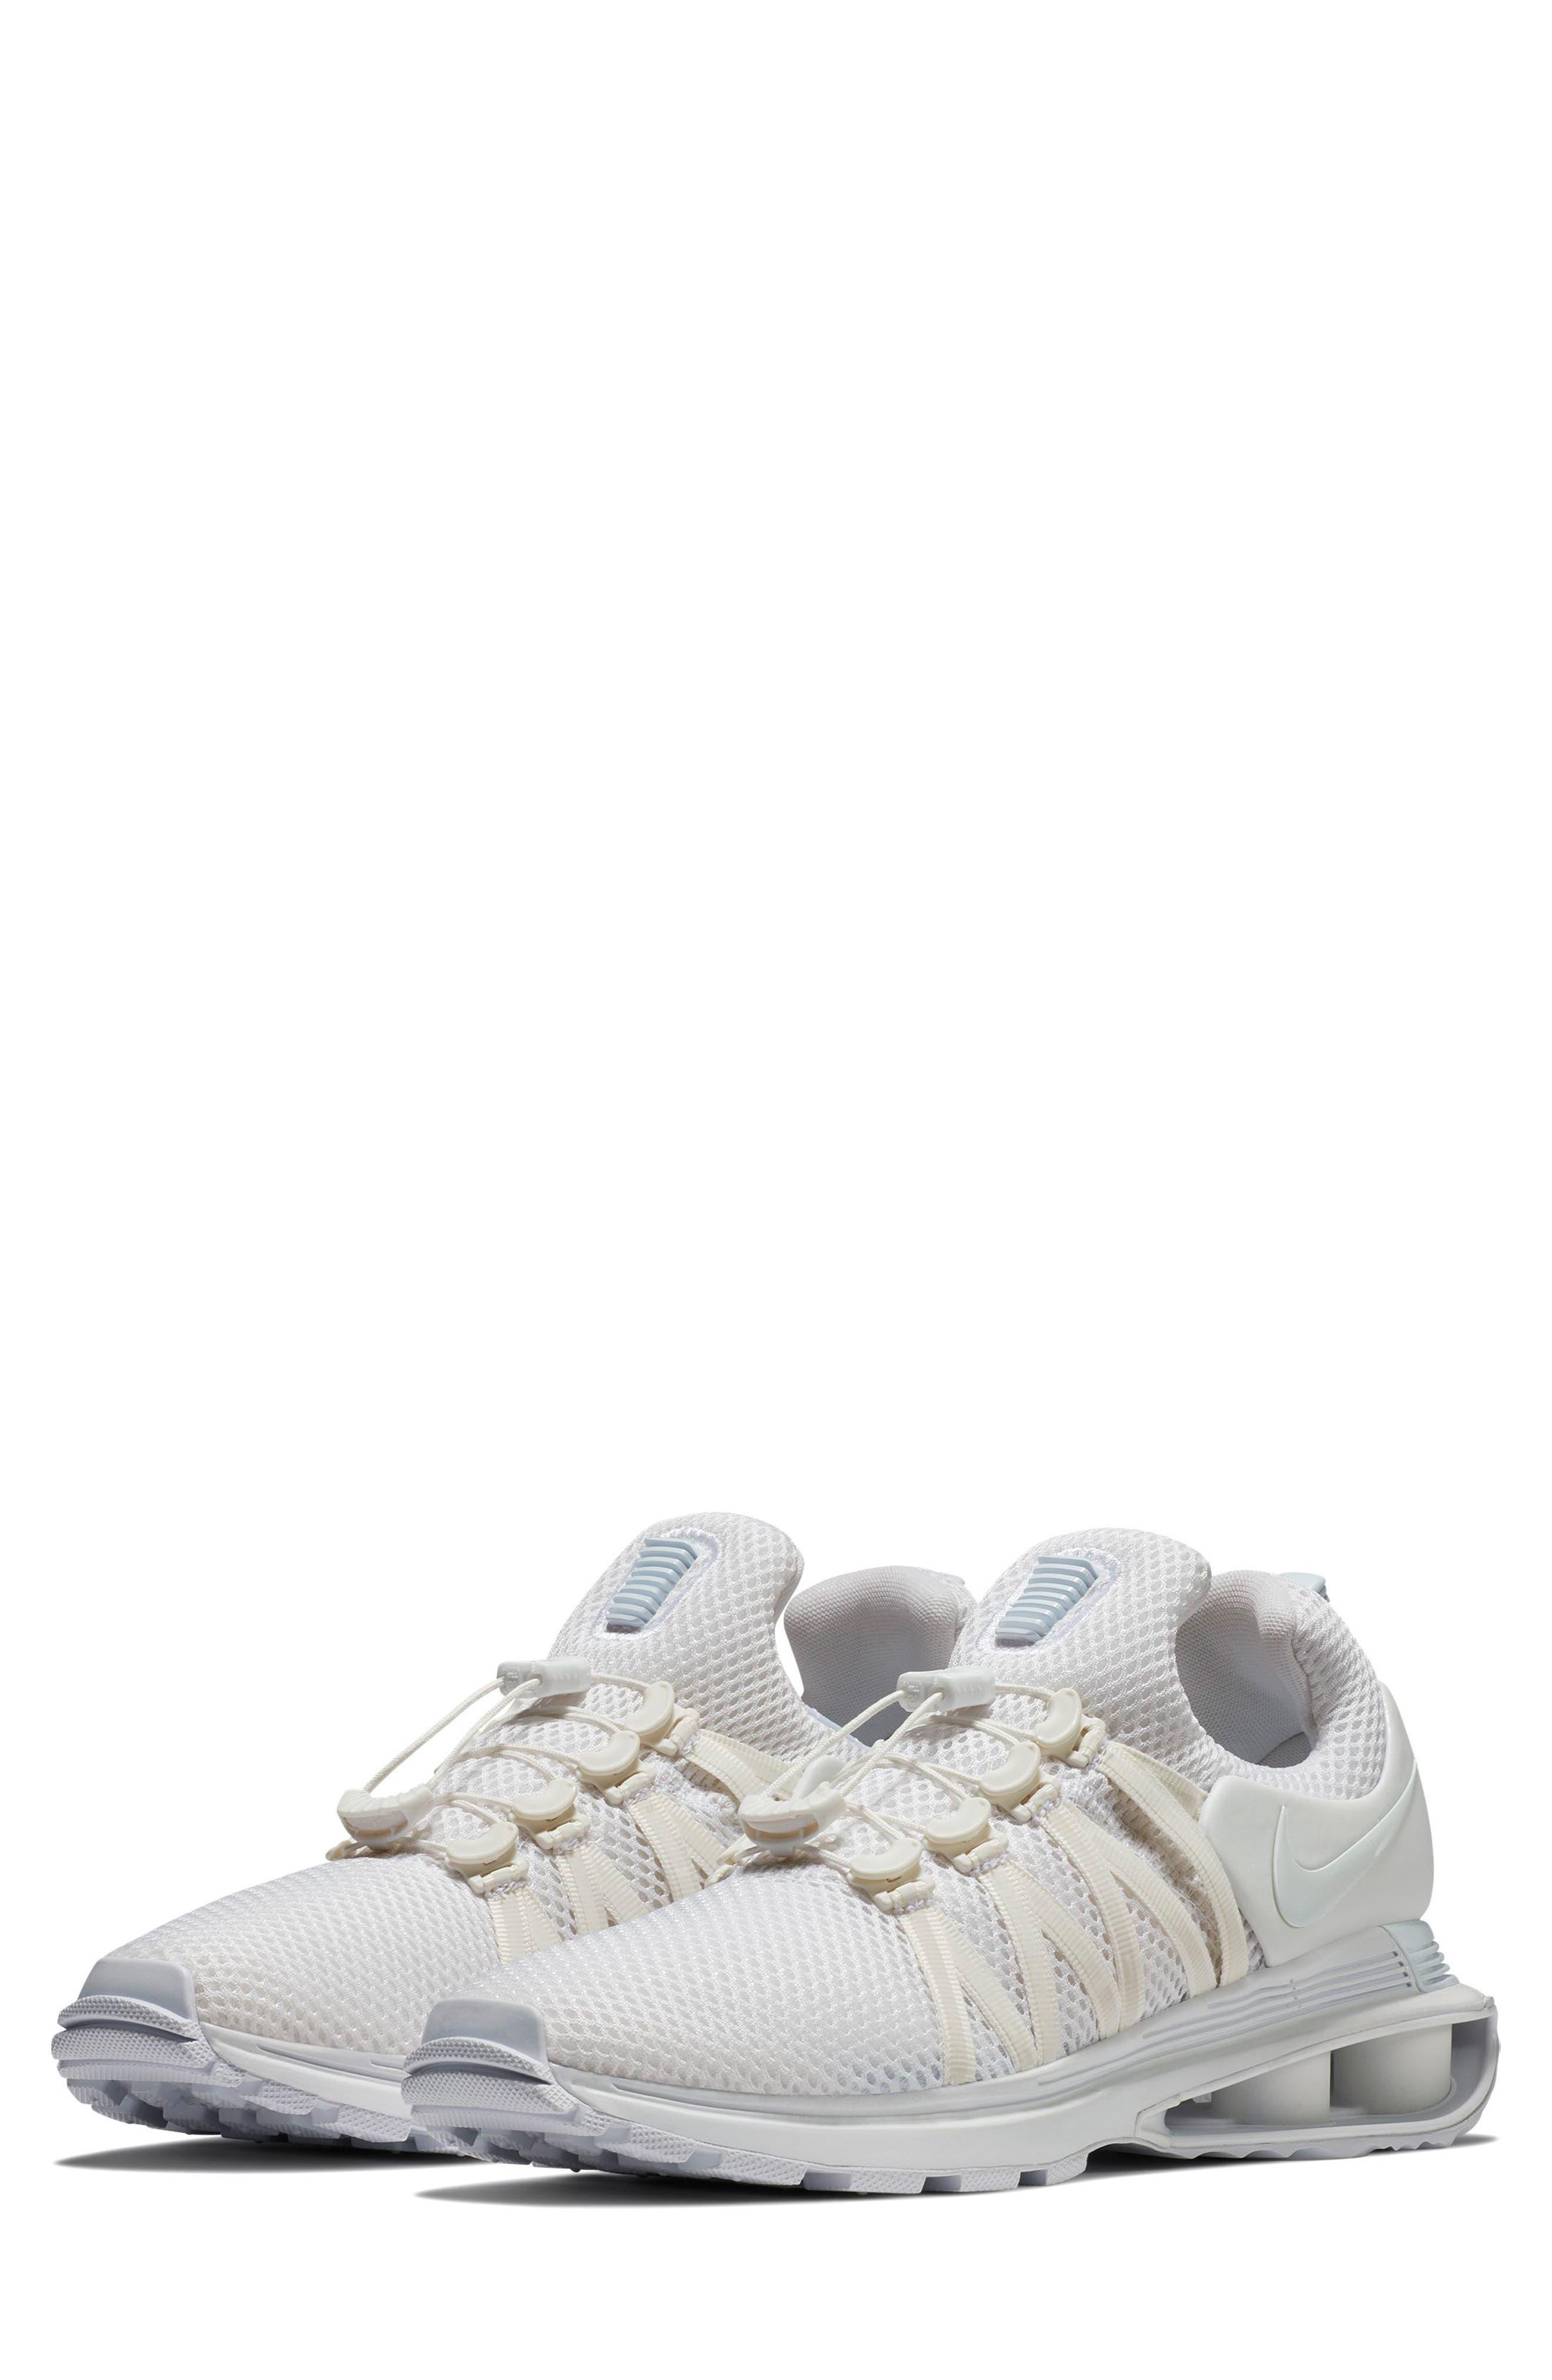 NIKE, Shox Gravity Sneaker, Main thumbnail 1, color, 100